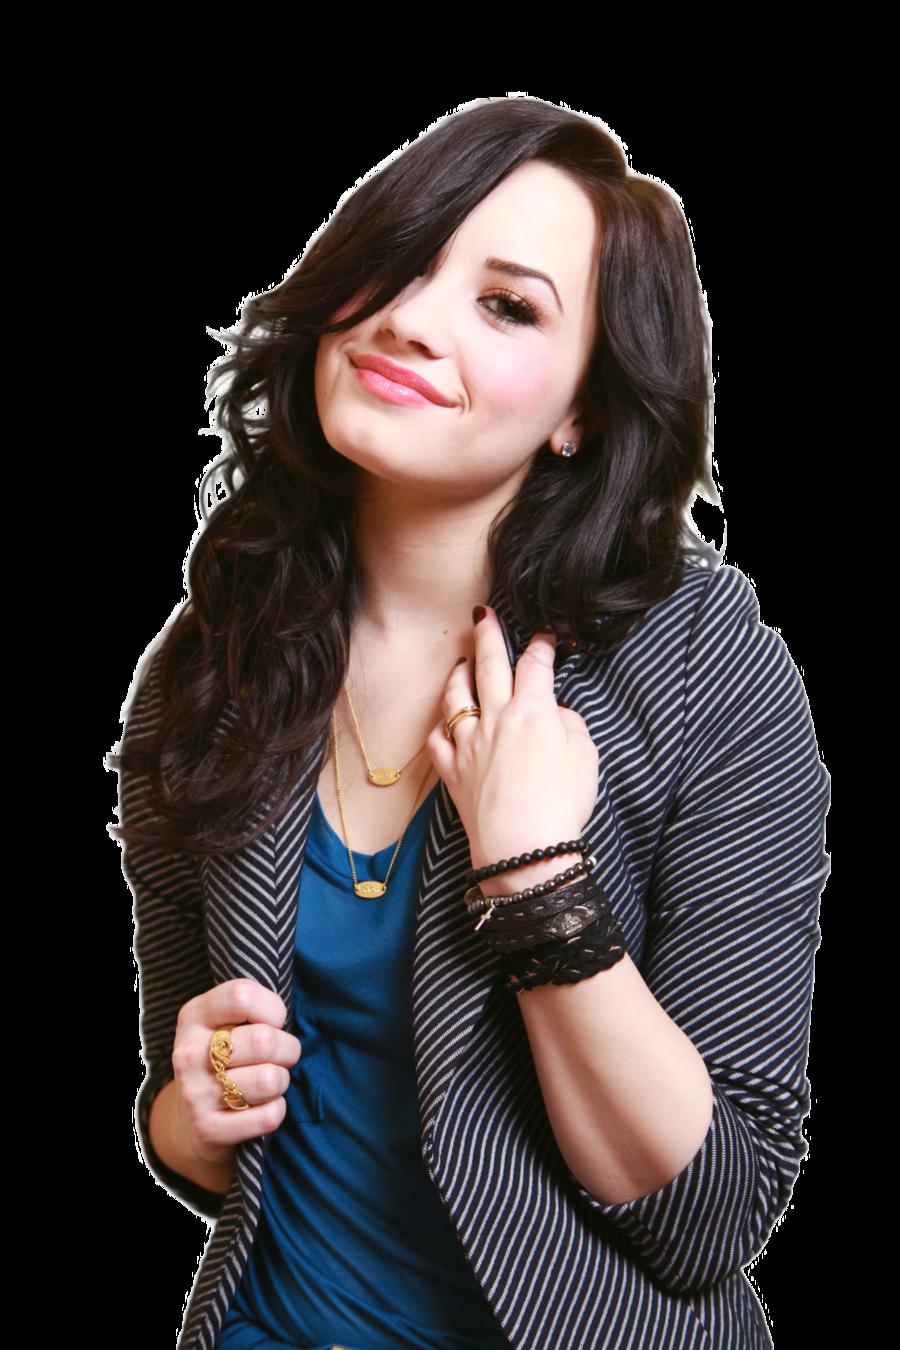 Download Demi Lovato HQ PNG Image.